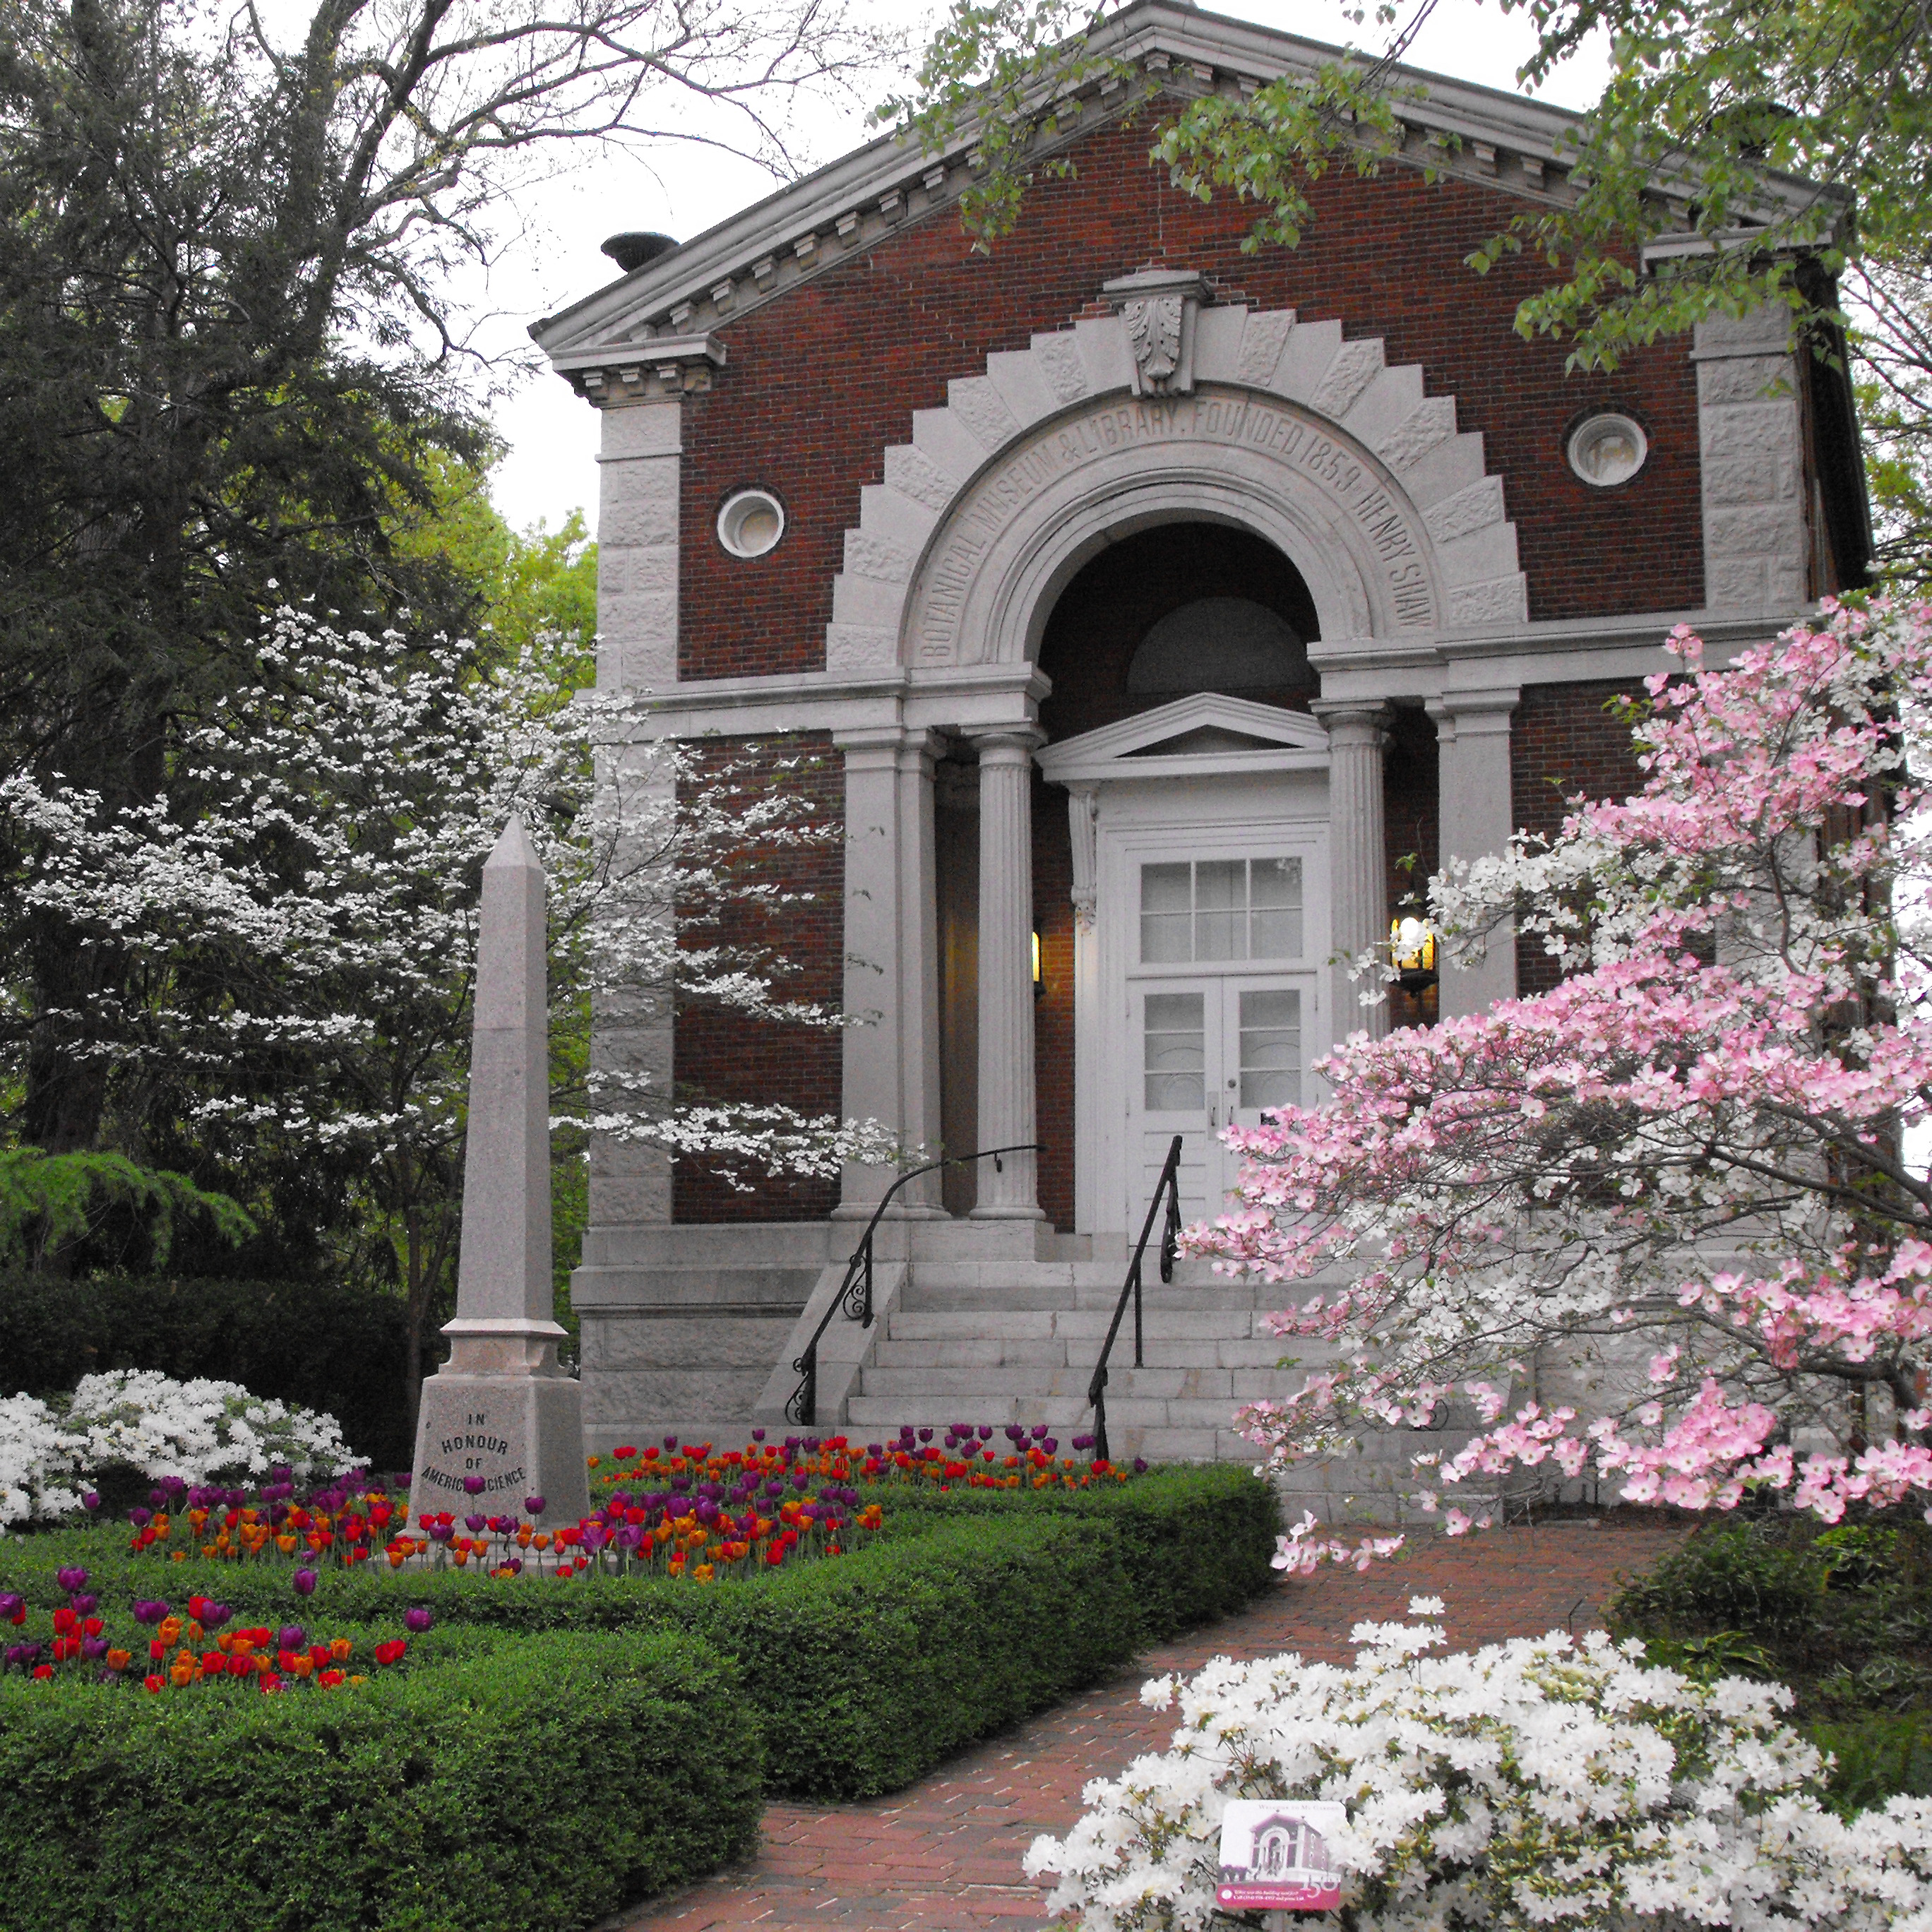 GLOW_Pathway_to_Museum_Building_120814_INCR.jpg